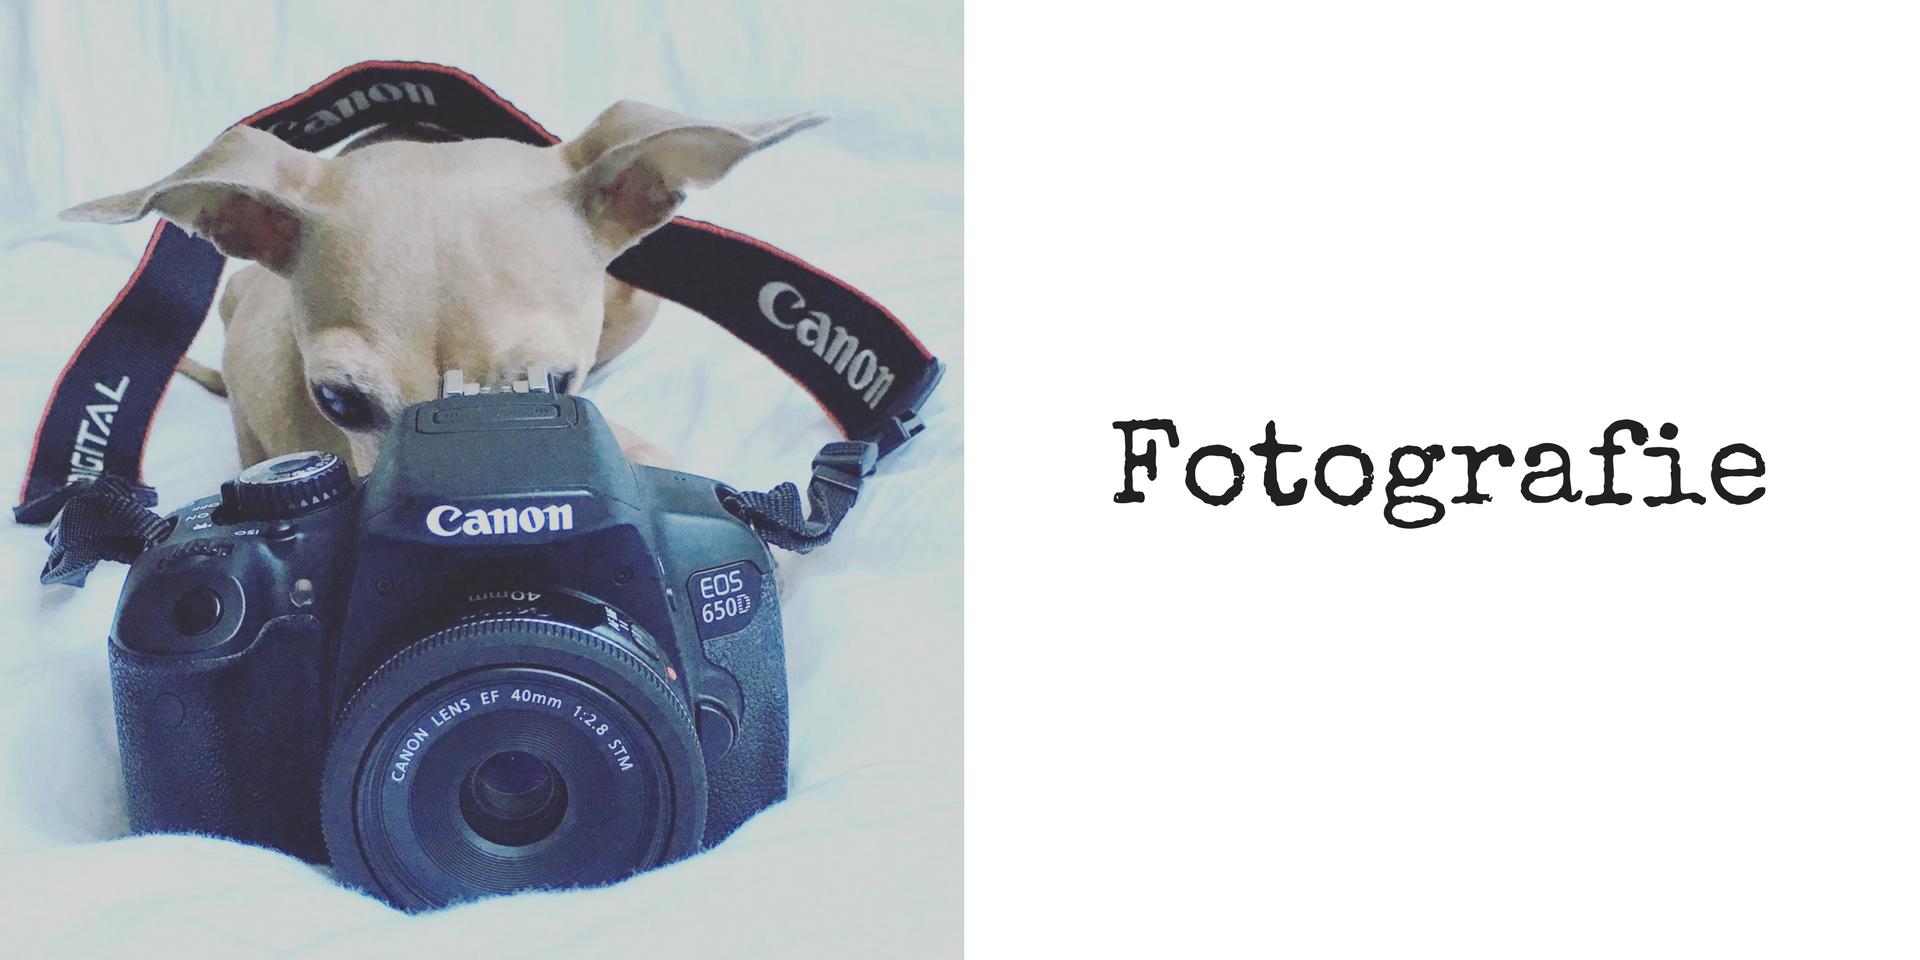 miDoggy Blog Community für Hunde Hundesport